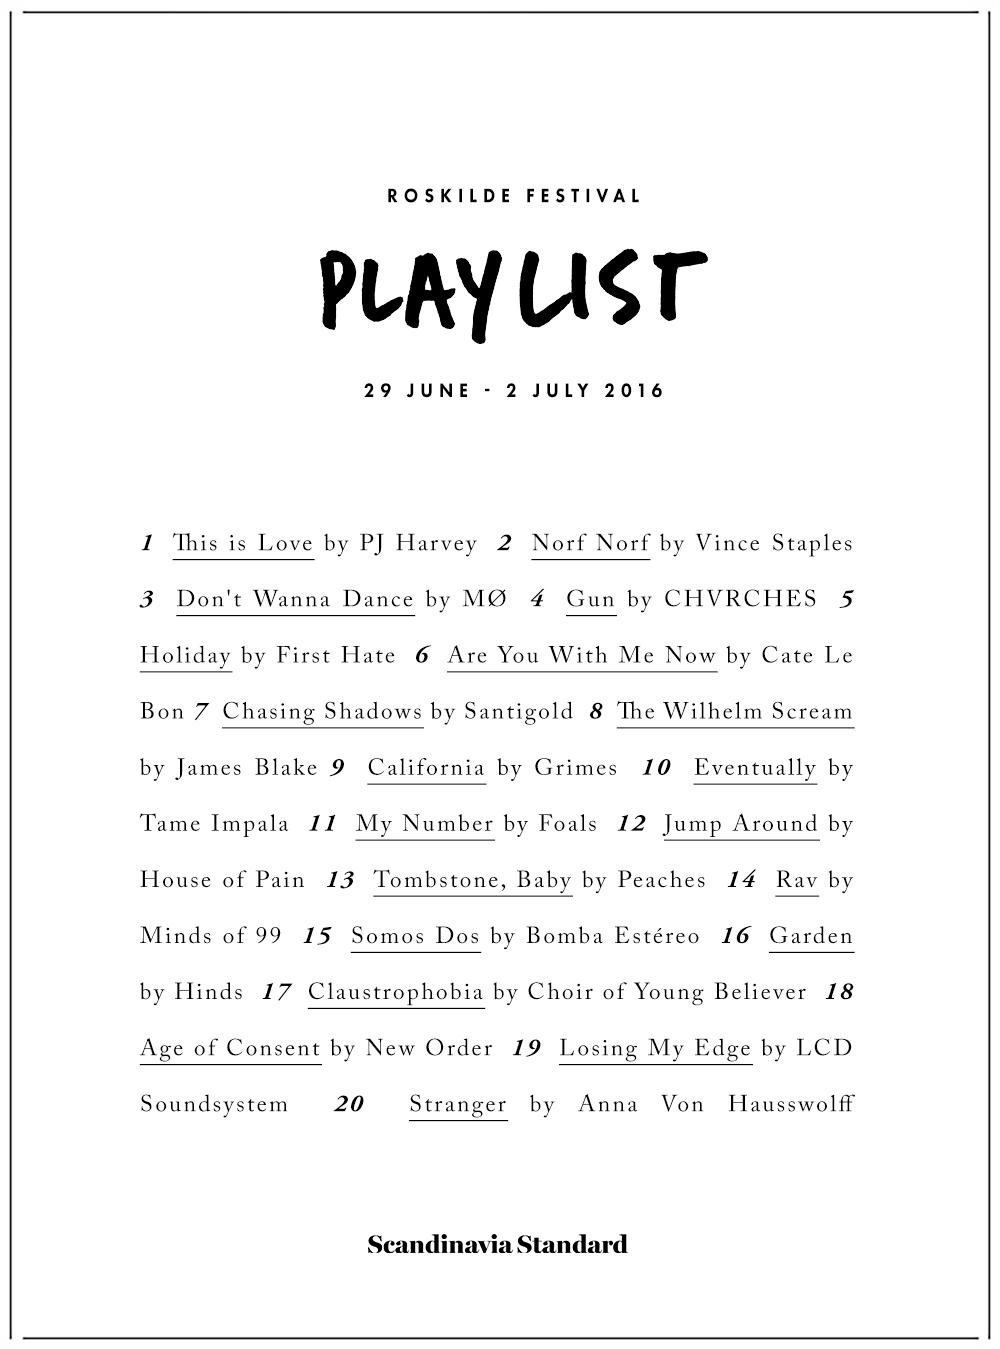 Roskilde Festival Playlist 2016 Party in a Post   Scandinavia Standard